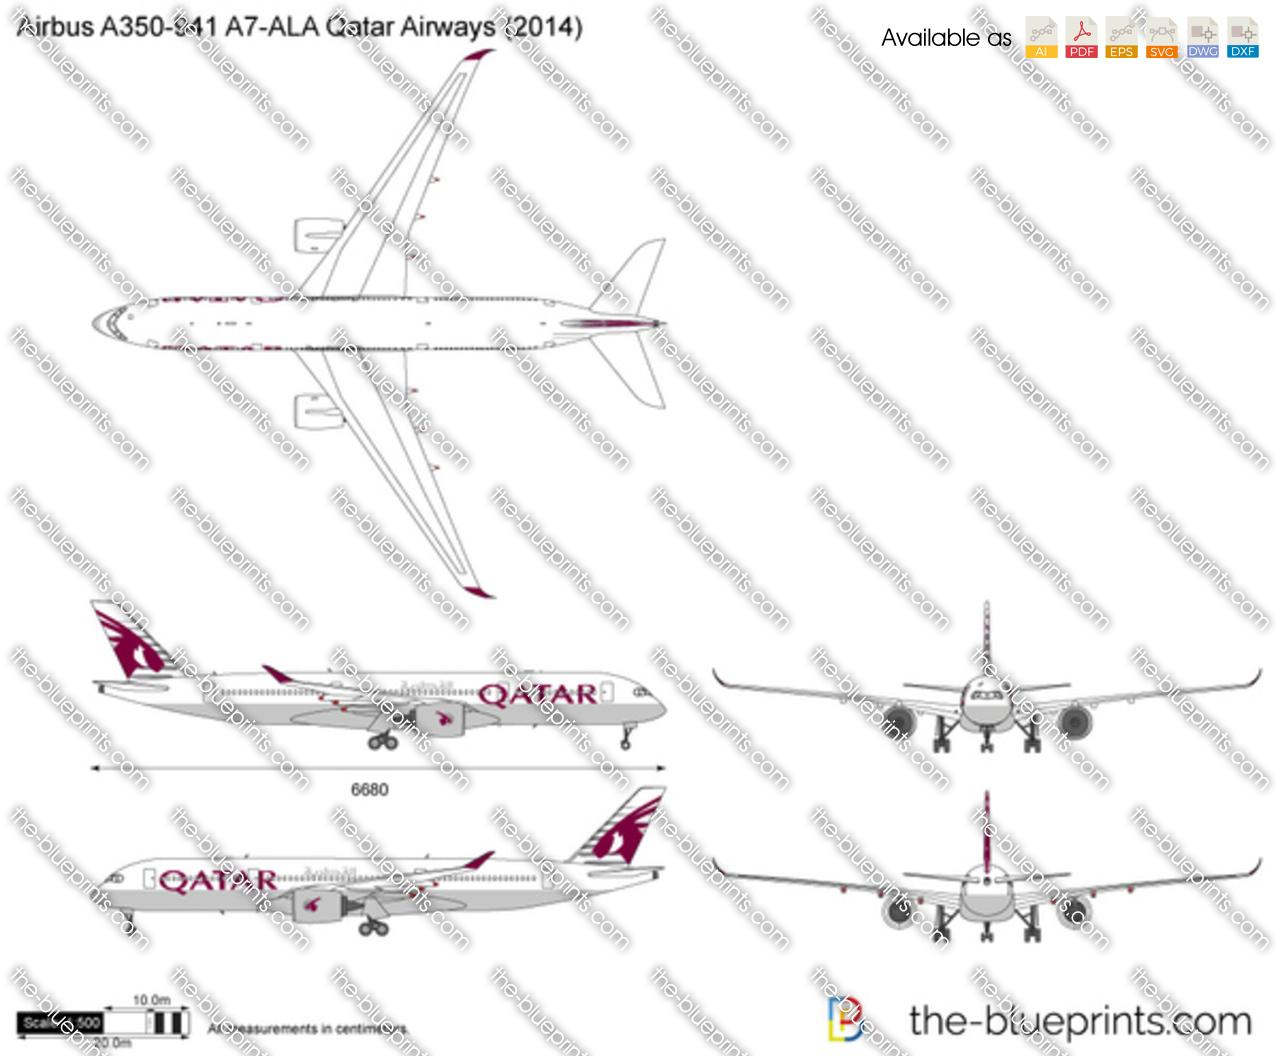 Airbus A350-941 A7-ALA Qatar Airways 2019